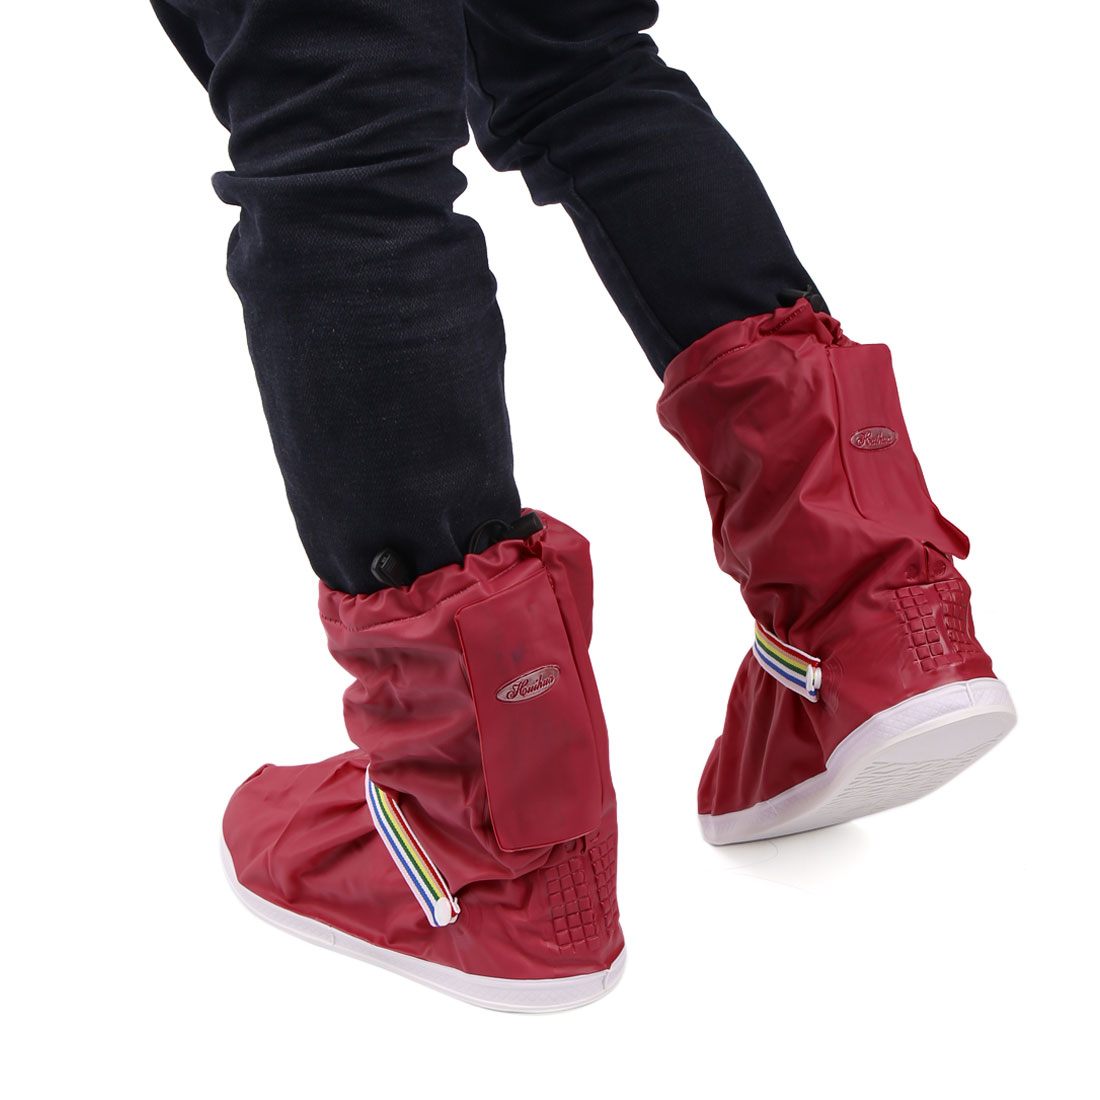 1Pair Wine Red Motorcycle Nonslip Waterproof Adjustable Rain Shoes Boot Cover XL - image 3 de 5